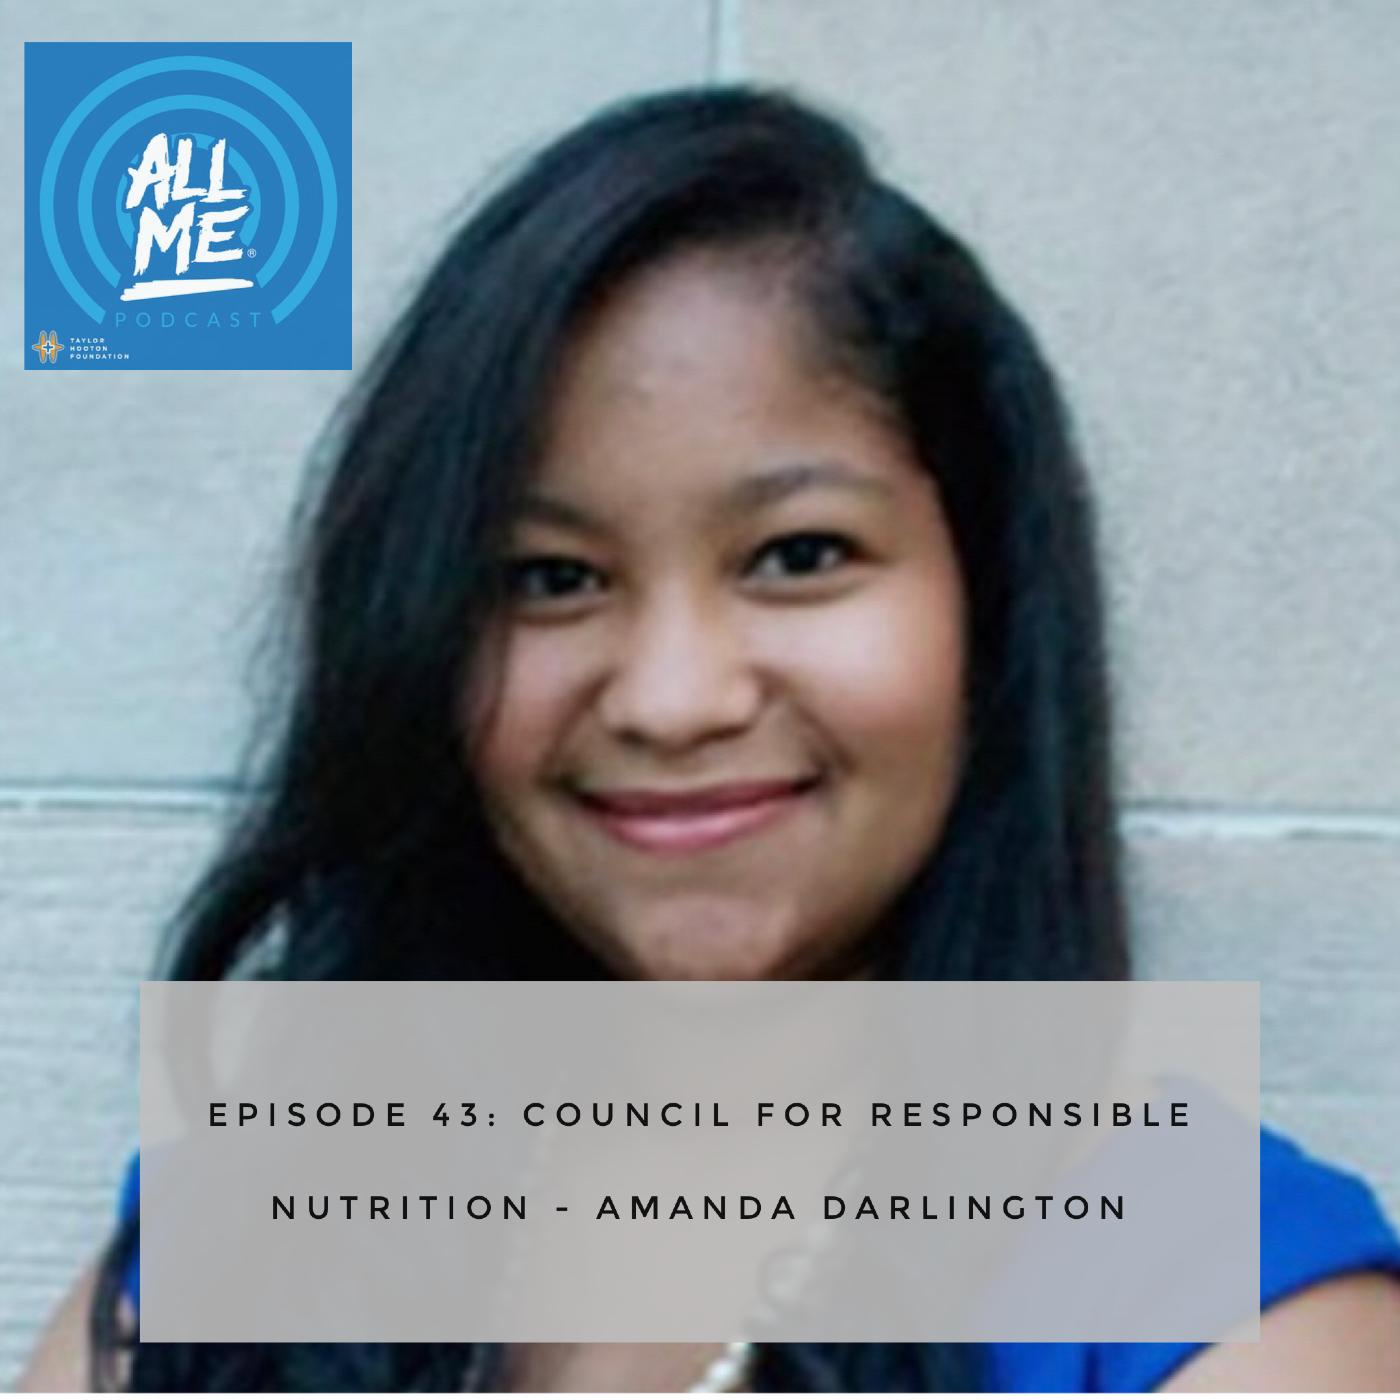 Episode 43: Council for Responsible Nutrition - Amanda Darlington